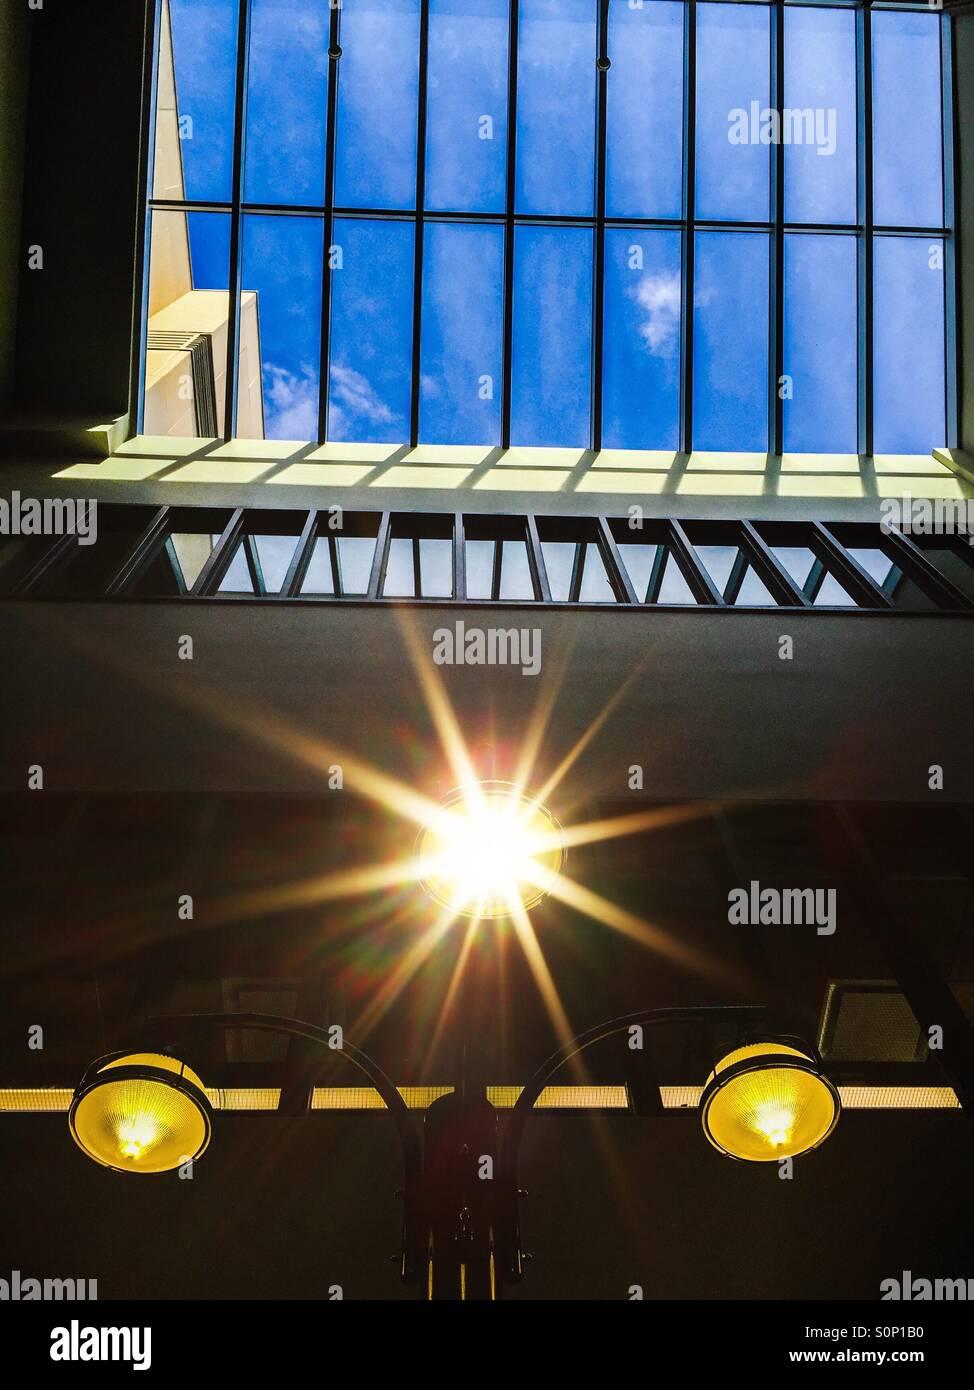 Three lights and a window - Stock Image